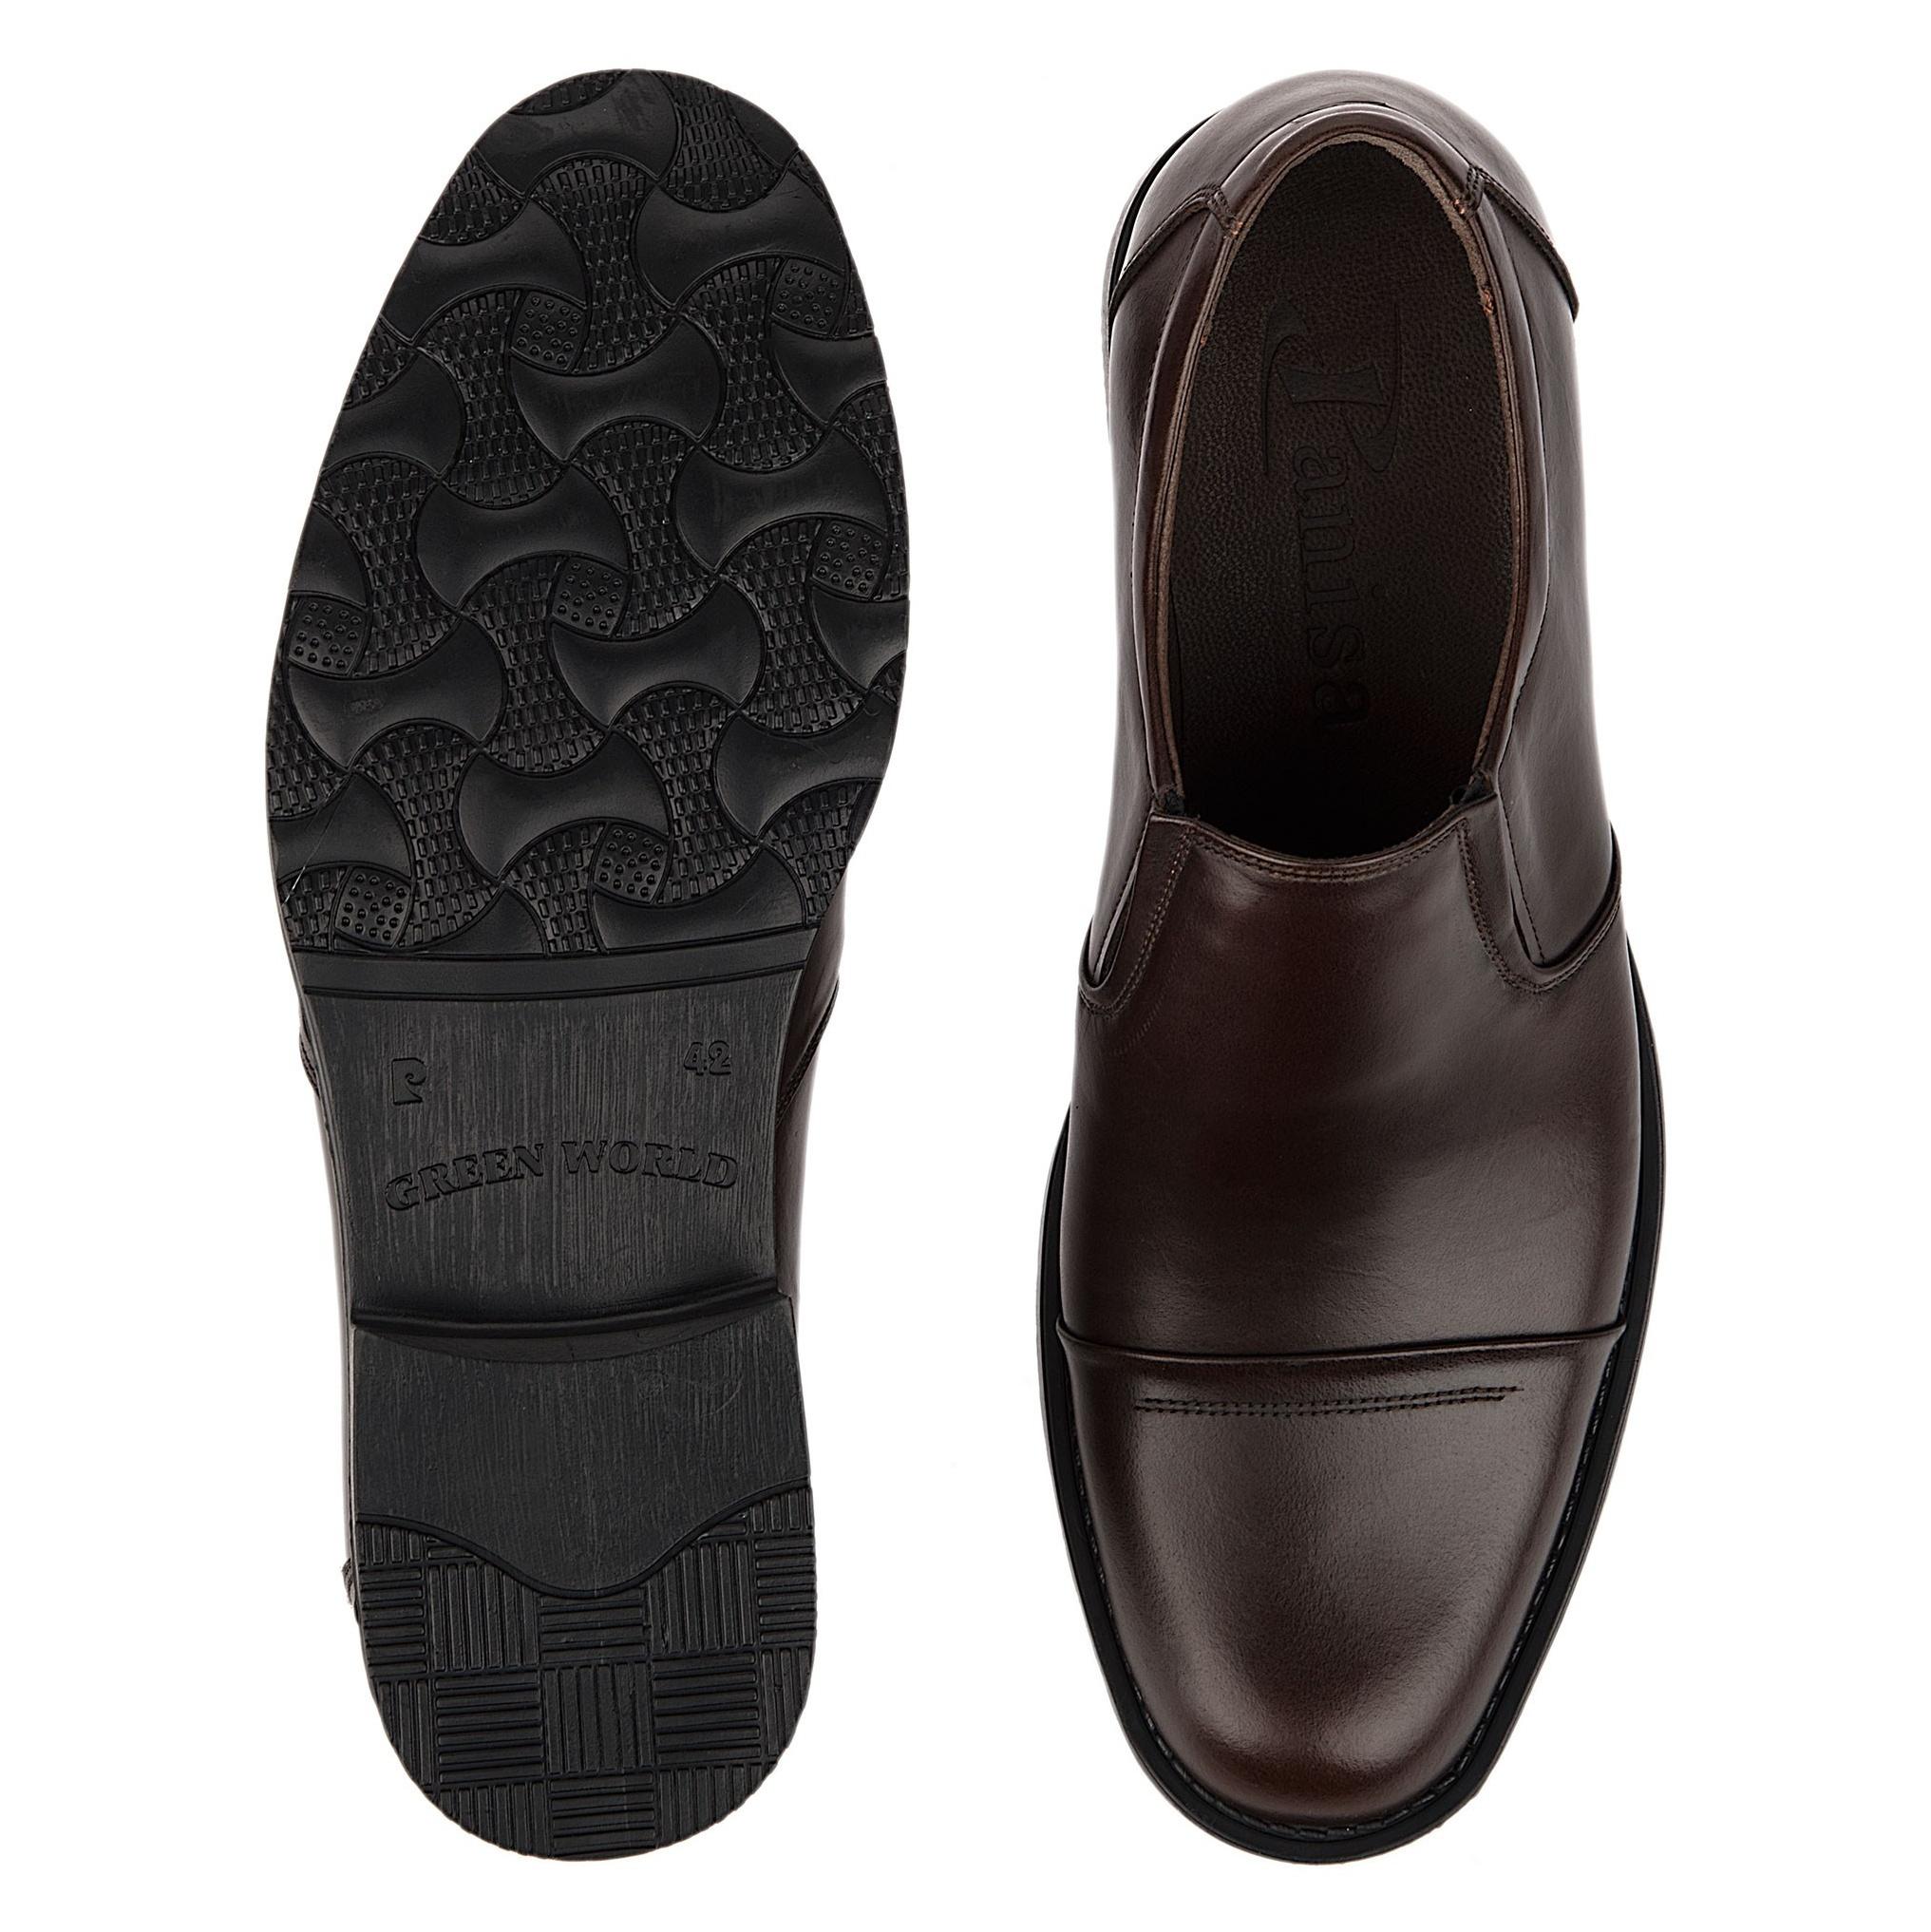 کفش اداری چرم مردانه - پانیسا - قهوه اي  - 2